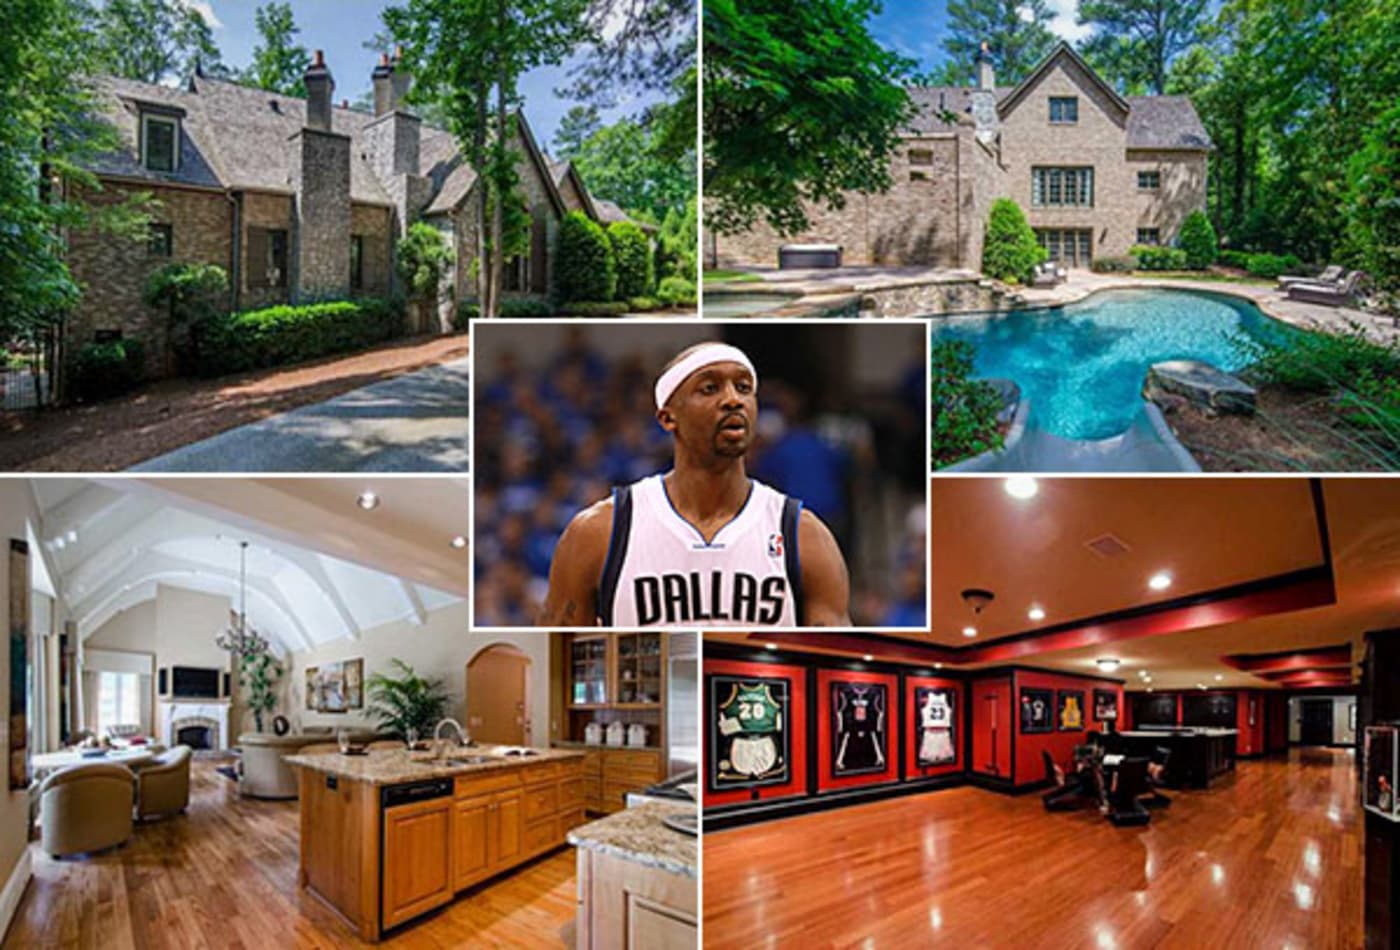 Jason-Terry-Coolest-Athlete-Homes.jpg